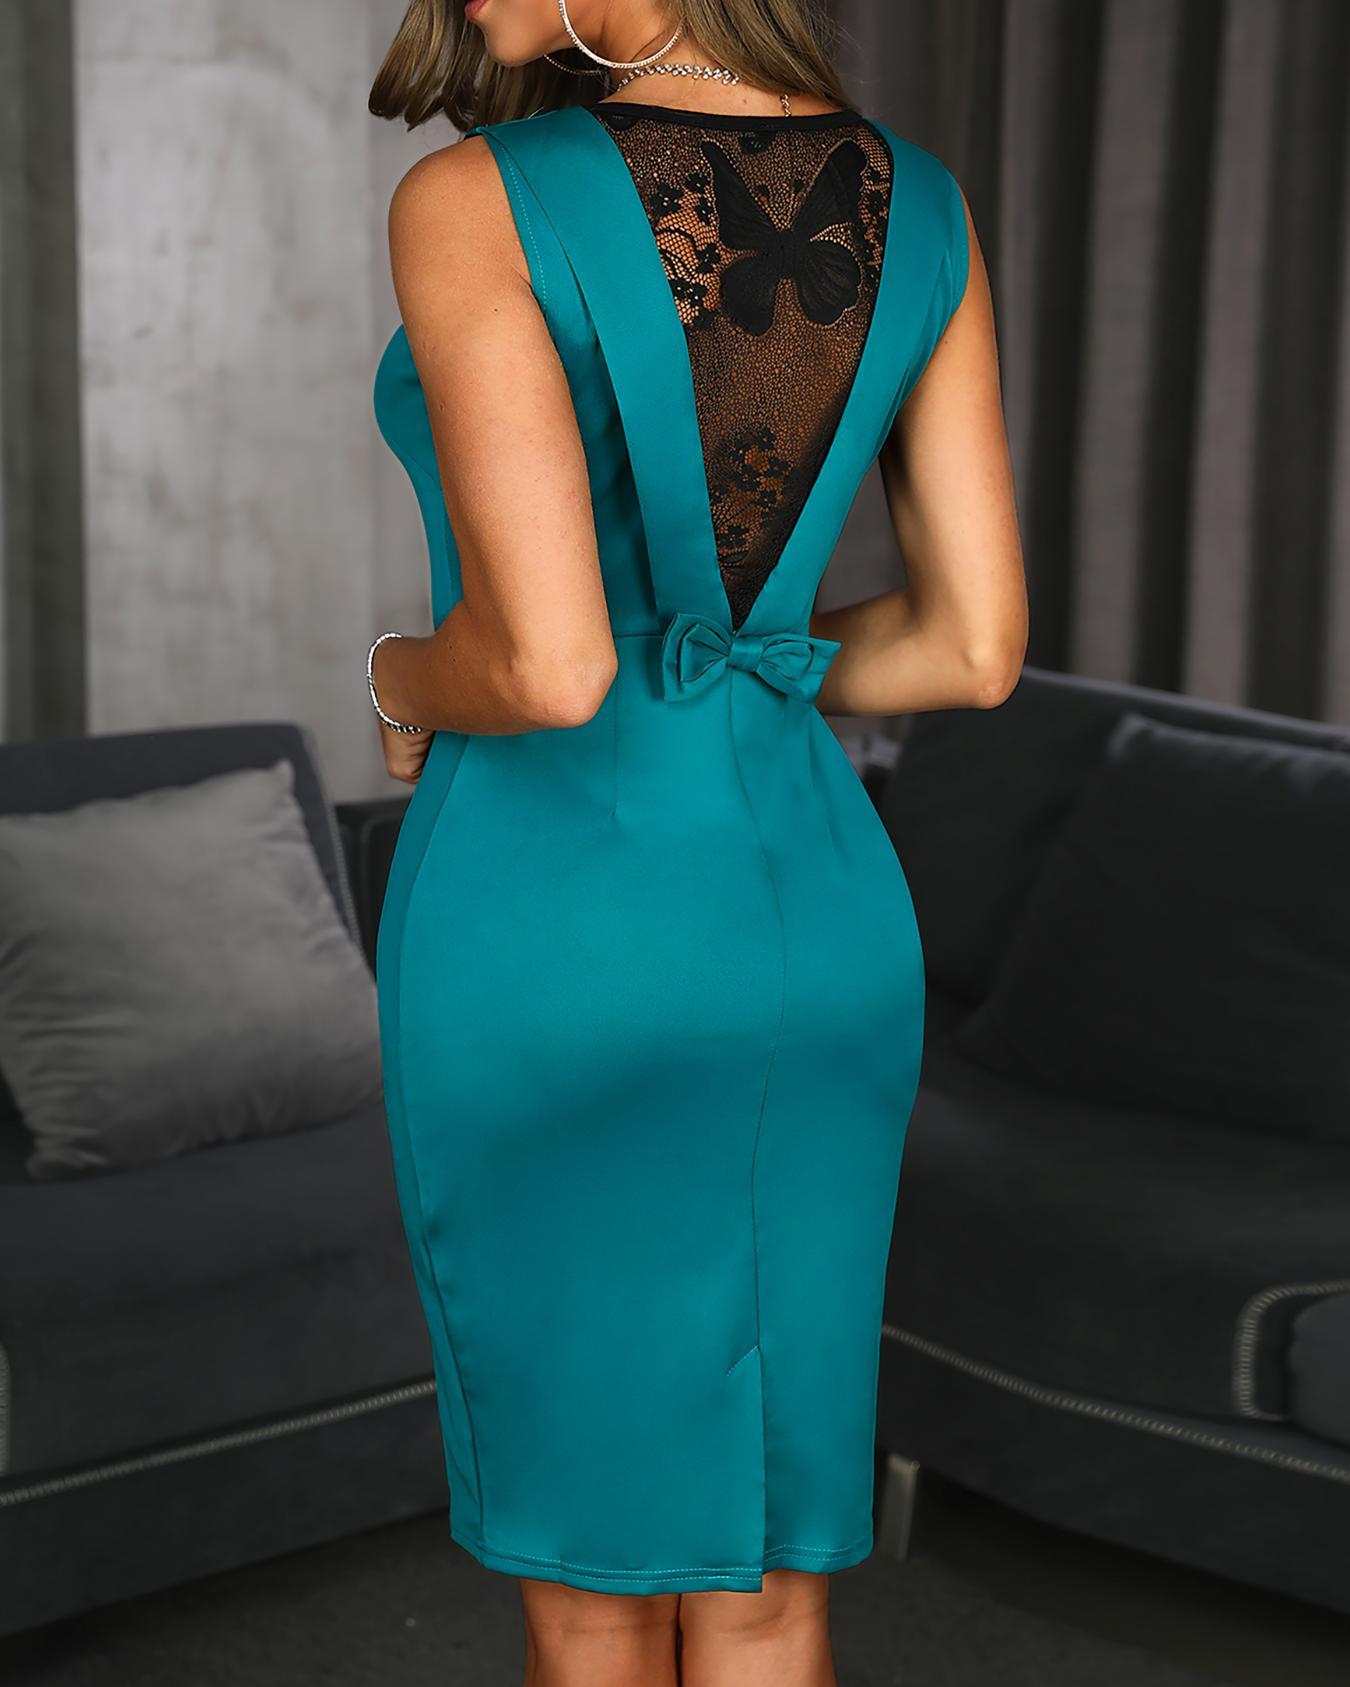 Lace Insert Bowknot Back Bodycon Dress